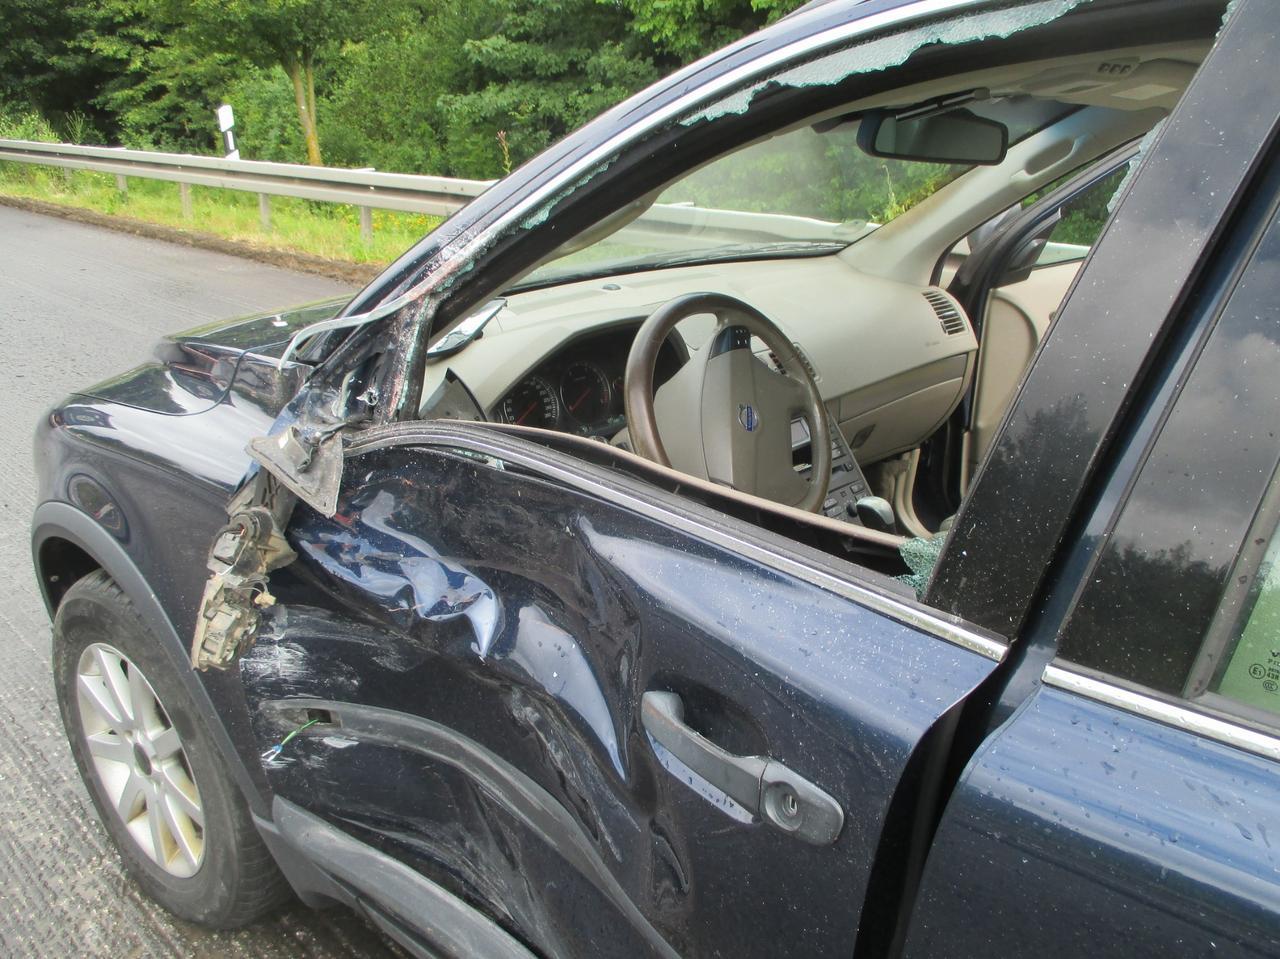 Auto kollidiert mit Lkw: 14000 Euro Schaden